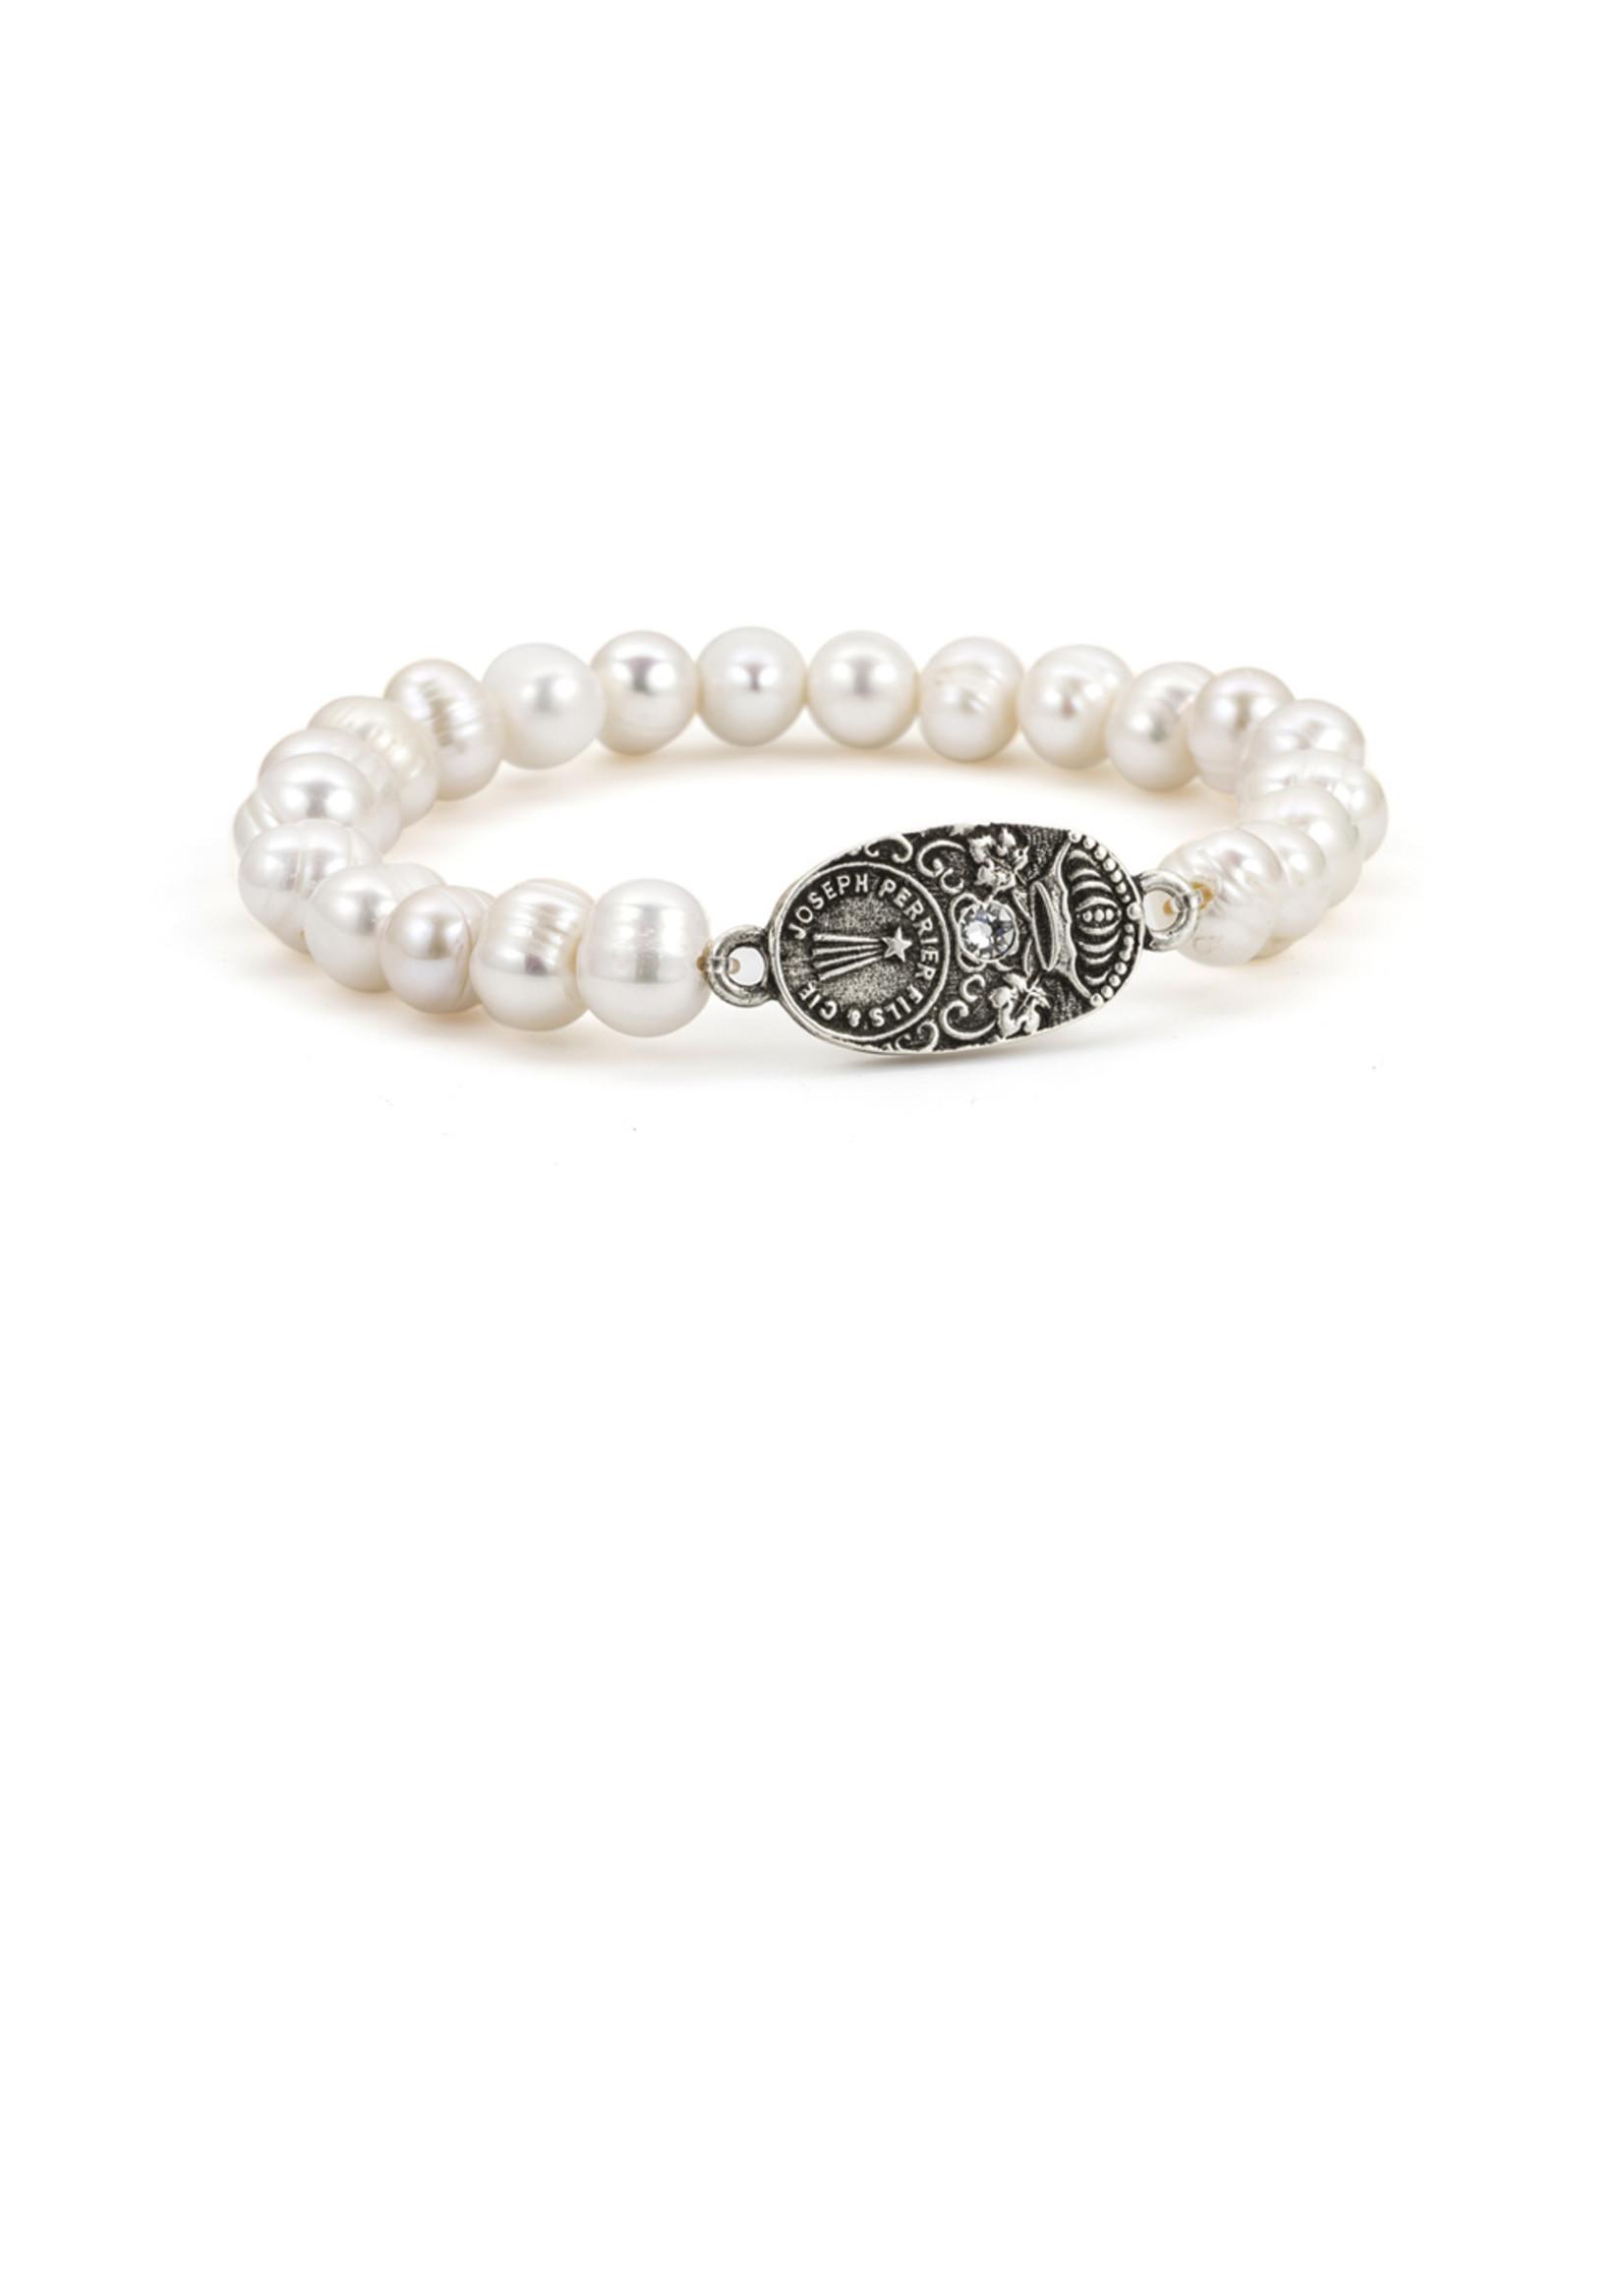 White Pearl with Swarovski Cuvee Pendant